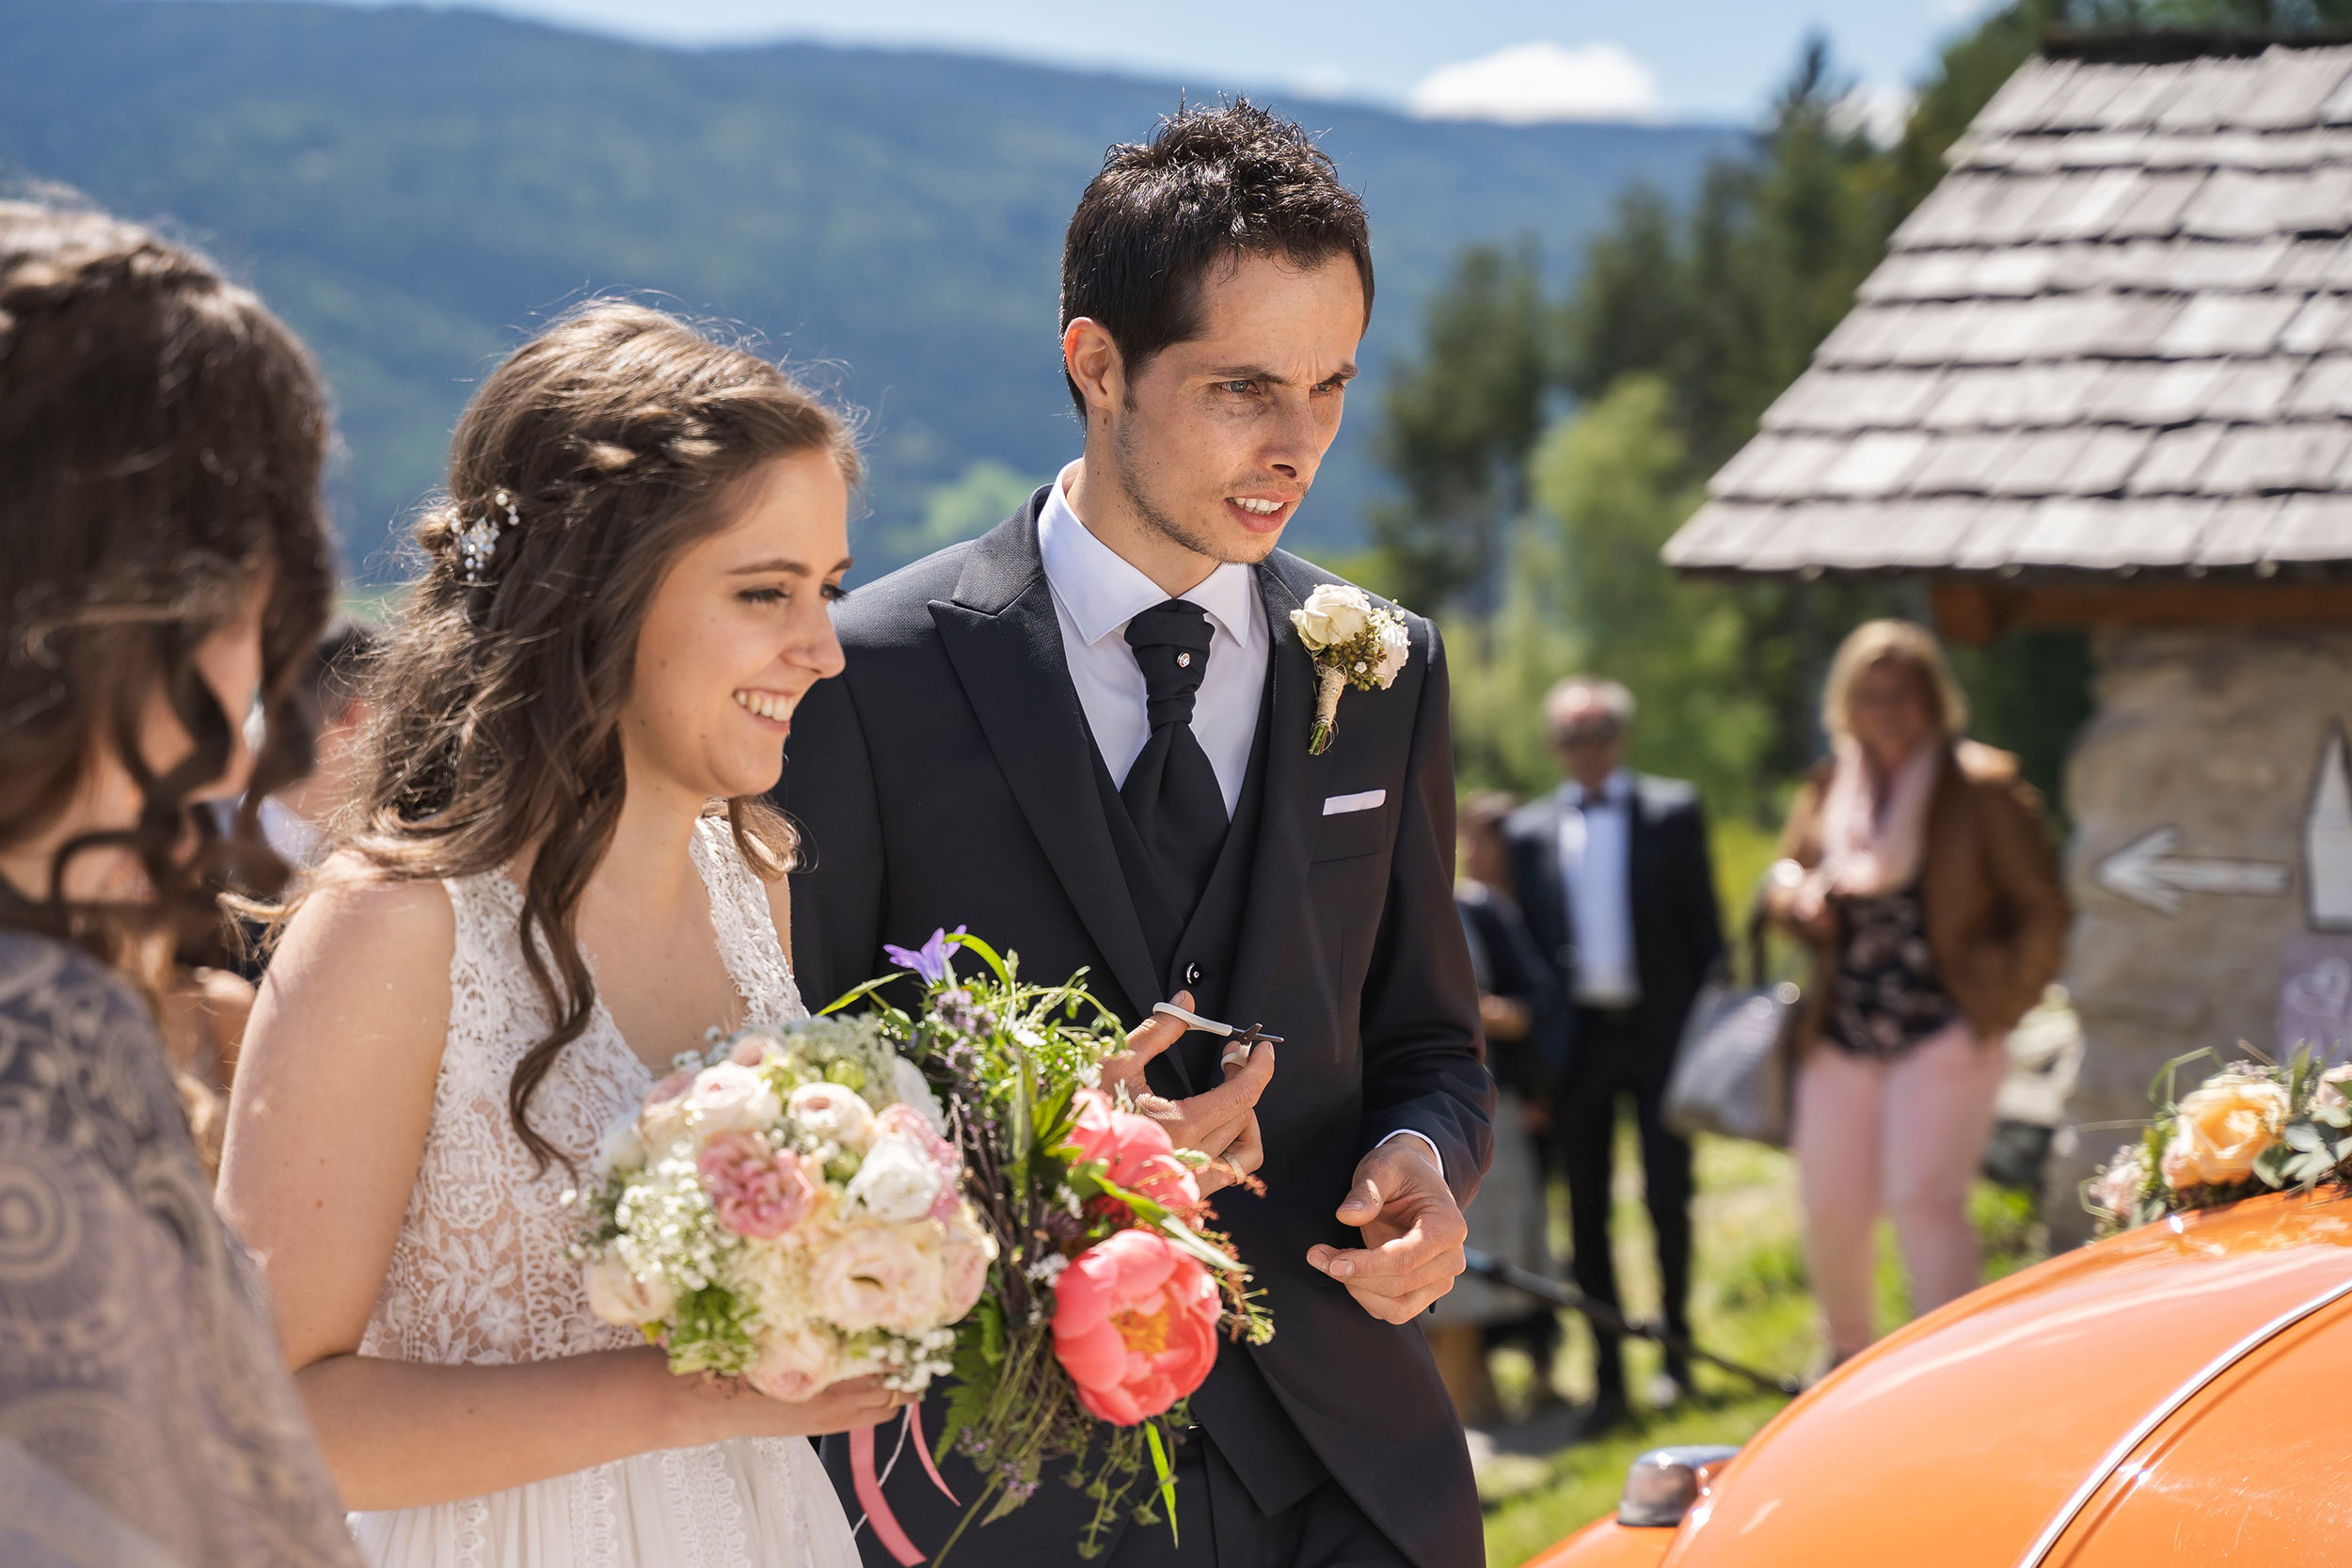 Evi_&_Christian_Hochzeit_01-06-2019_311